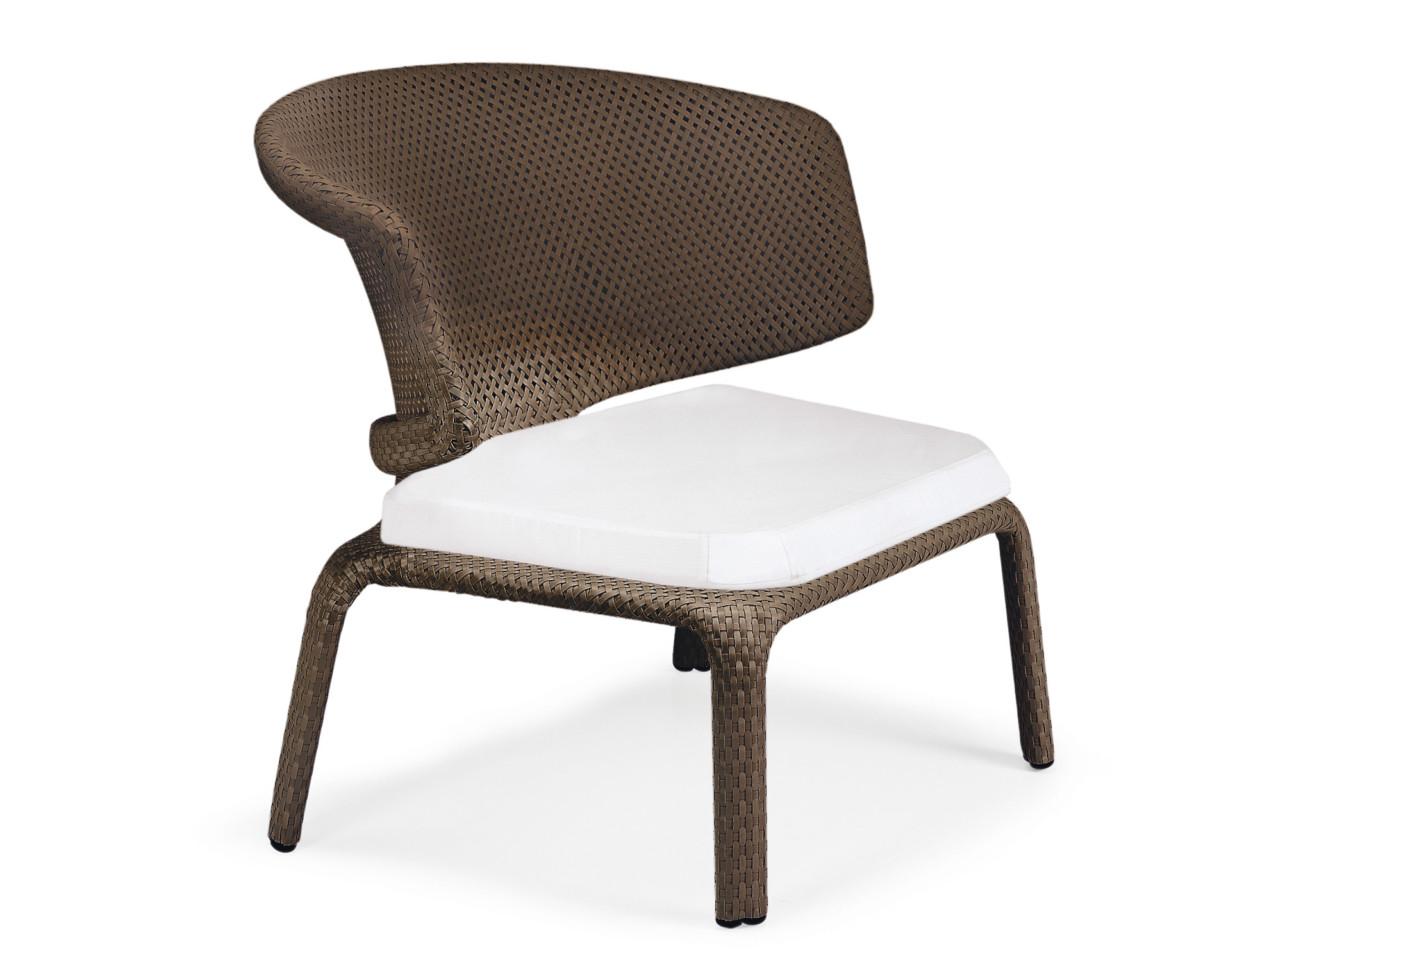 Seashell Lounge Chair By Dedon Stylepark